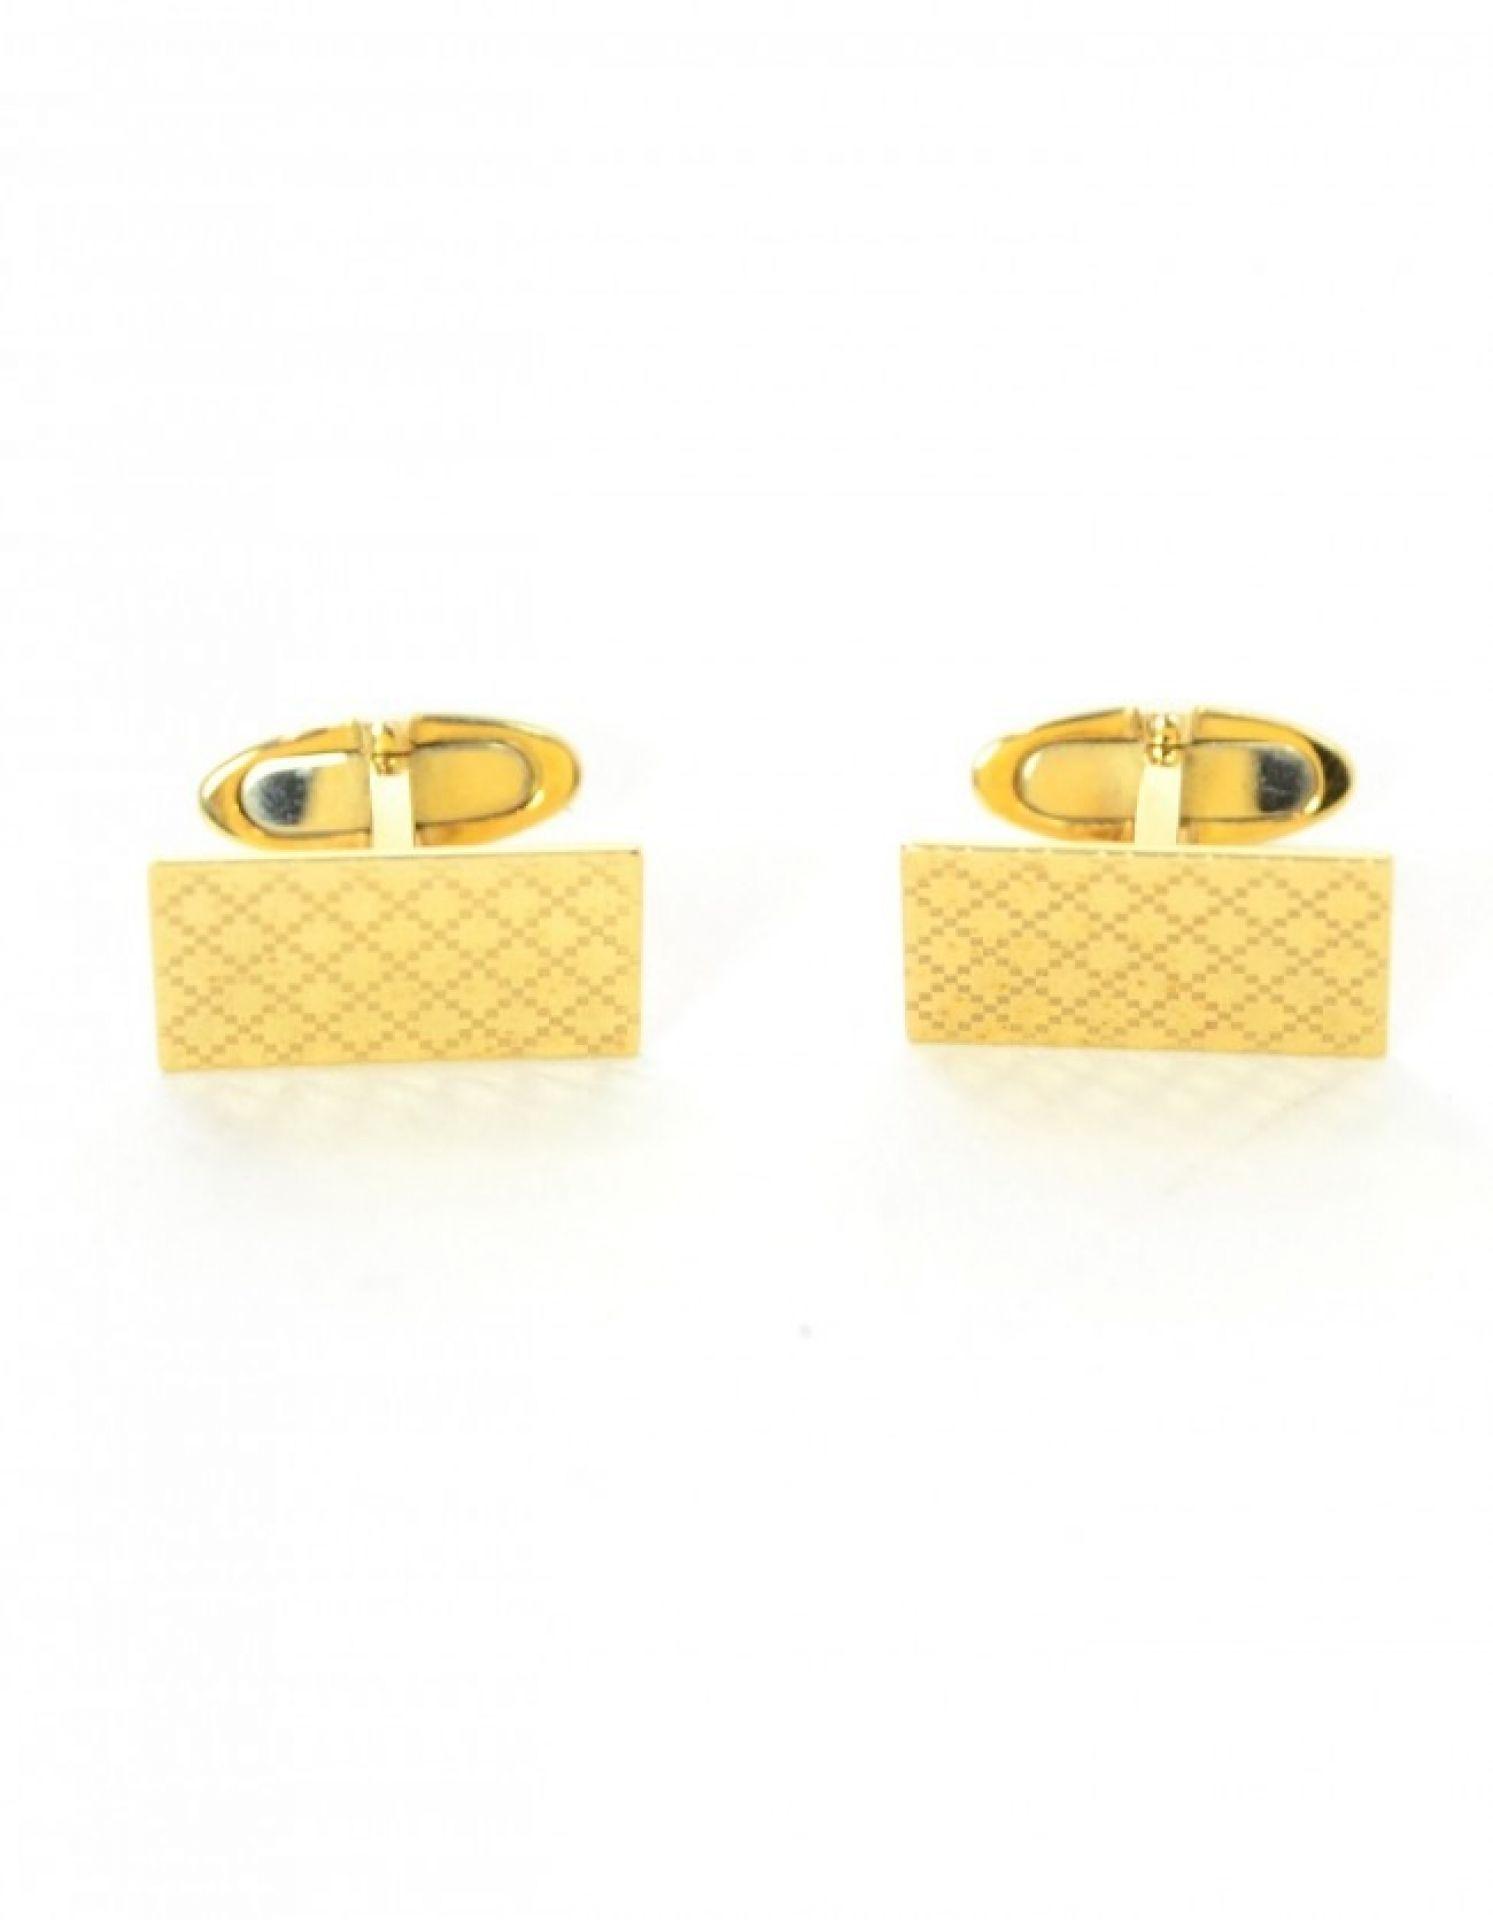 Gucci Men's 18K Yellow Gold Diamantissima Cufflinks